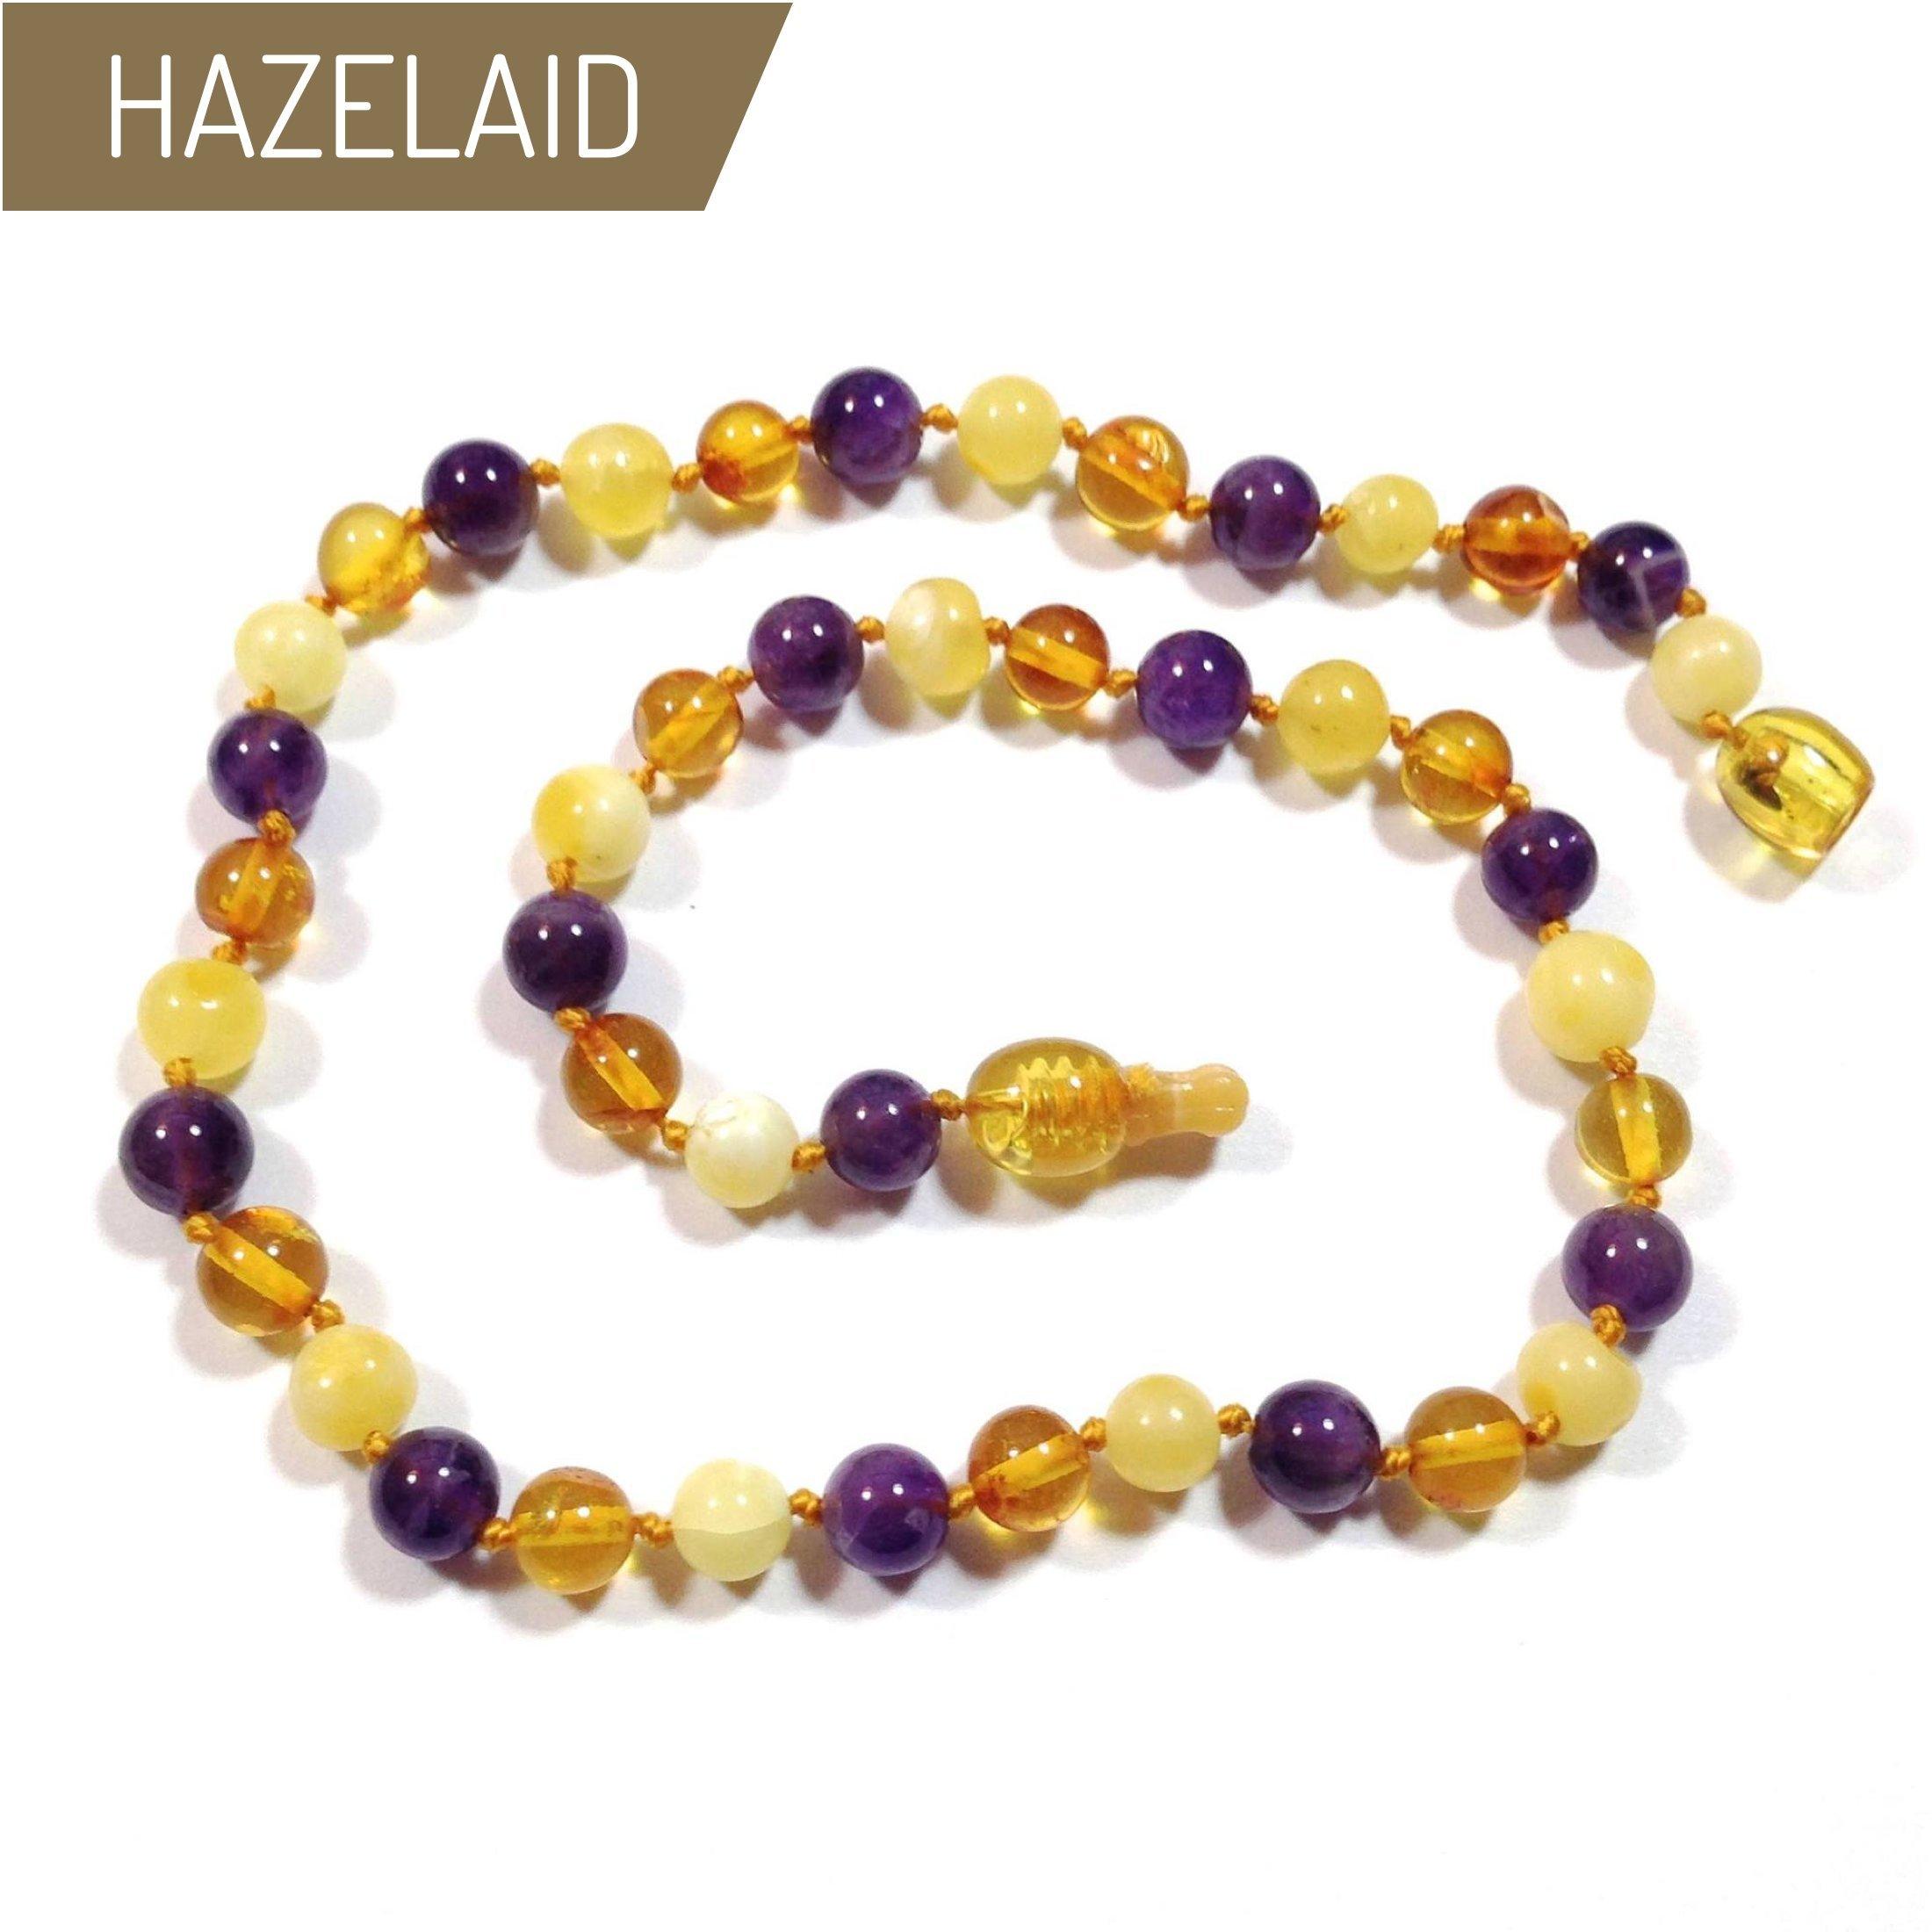 Hazelaid (TM) 14'' Pop-Clasp Baltic Amber & Gemstone: Honey & Butter & Amethyst